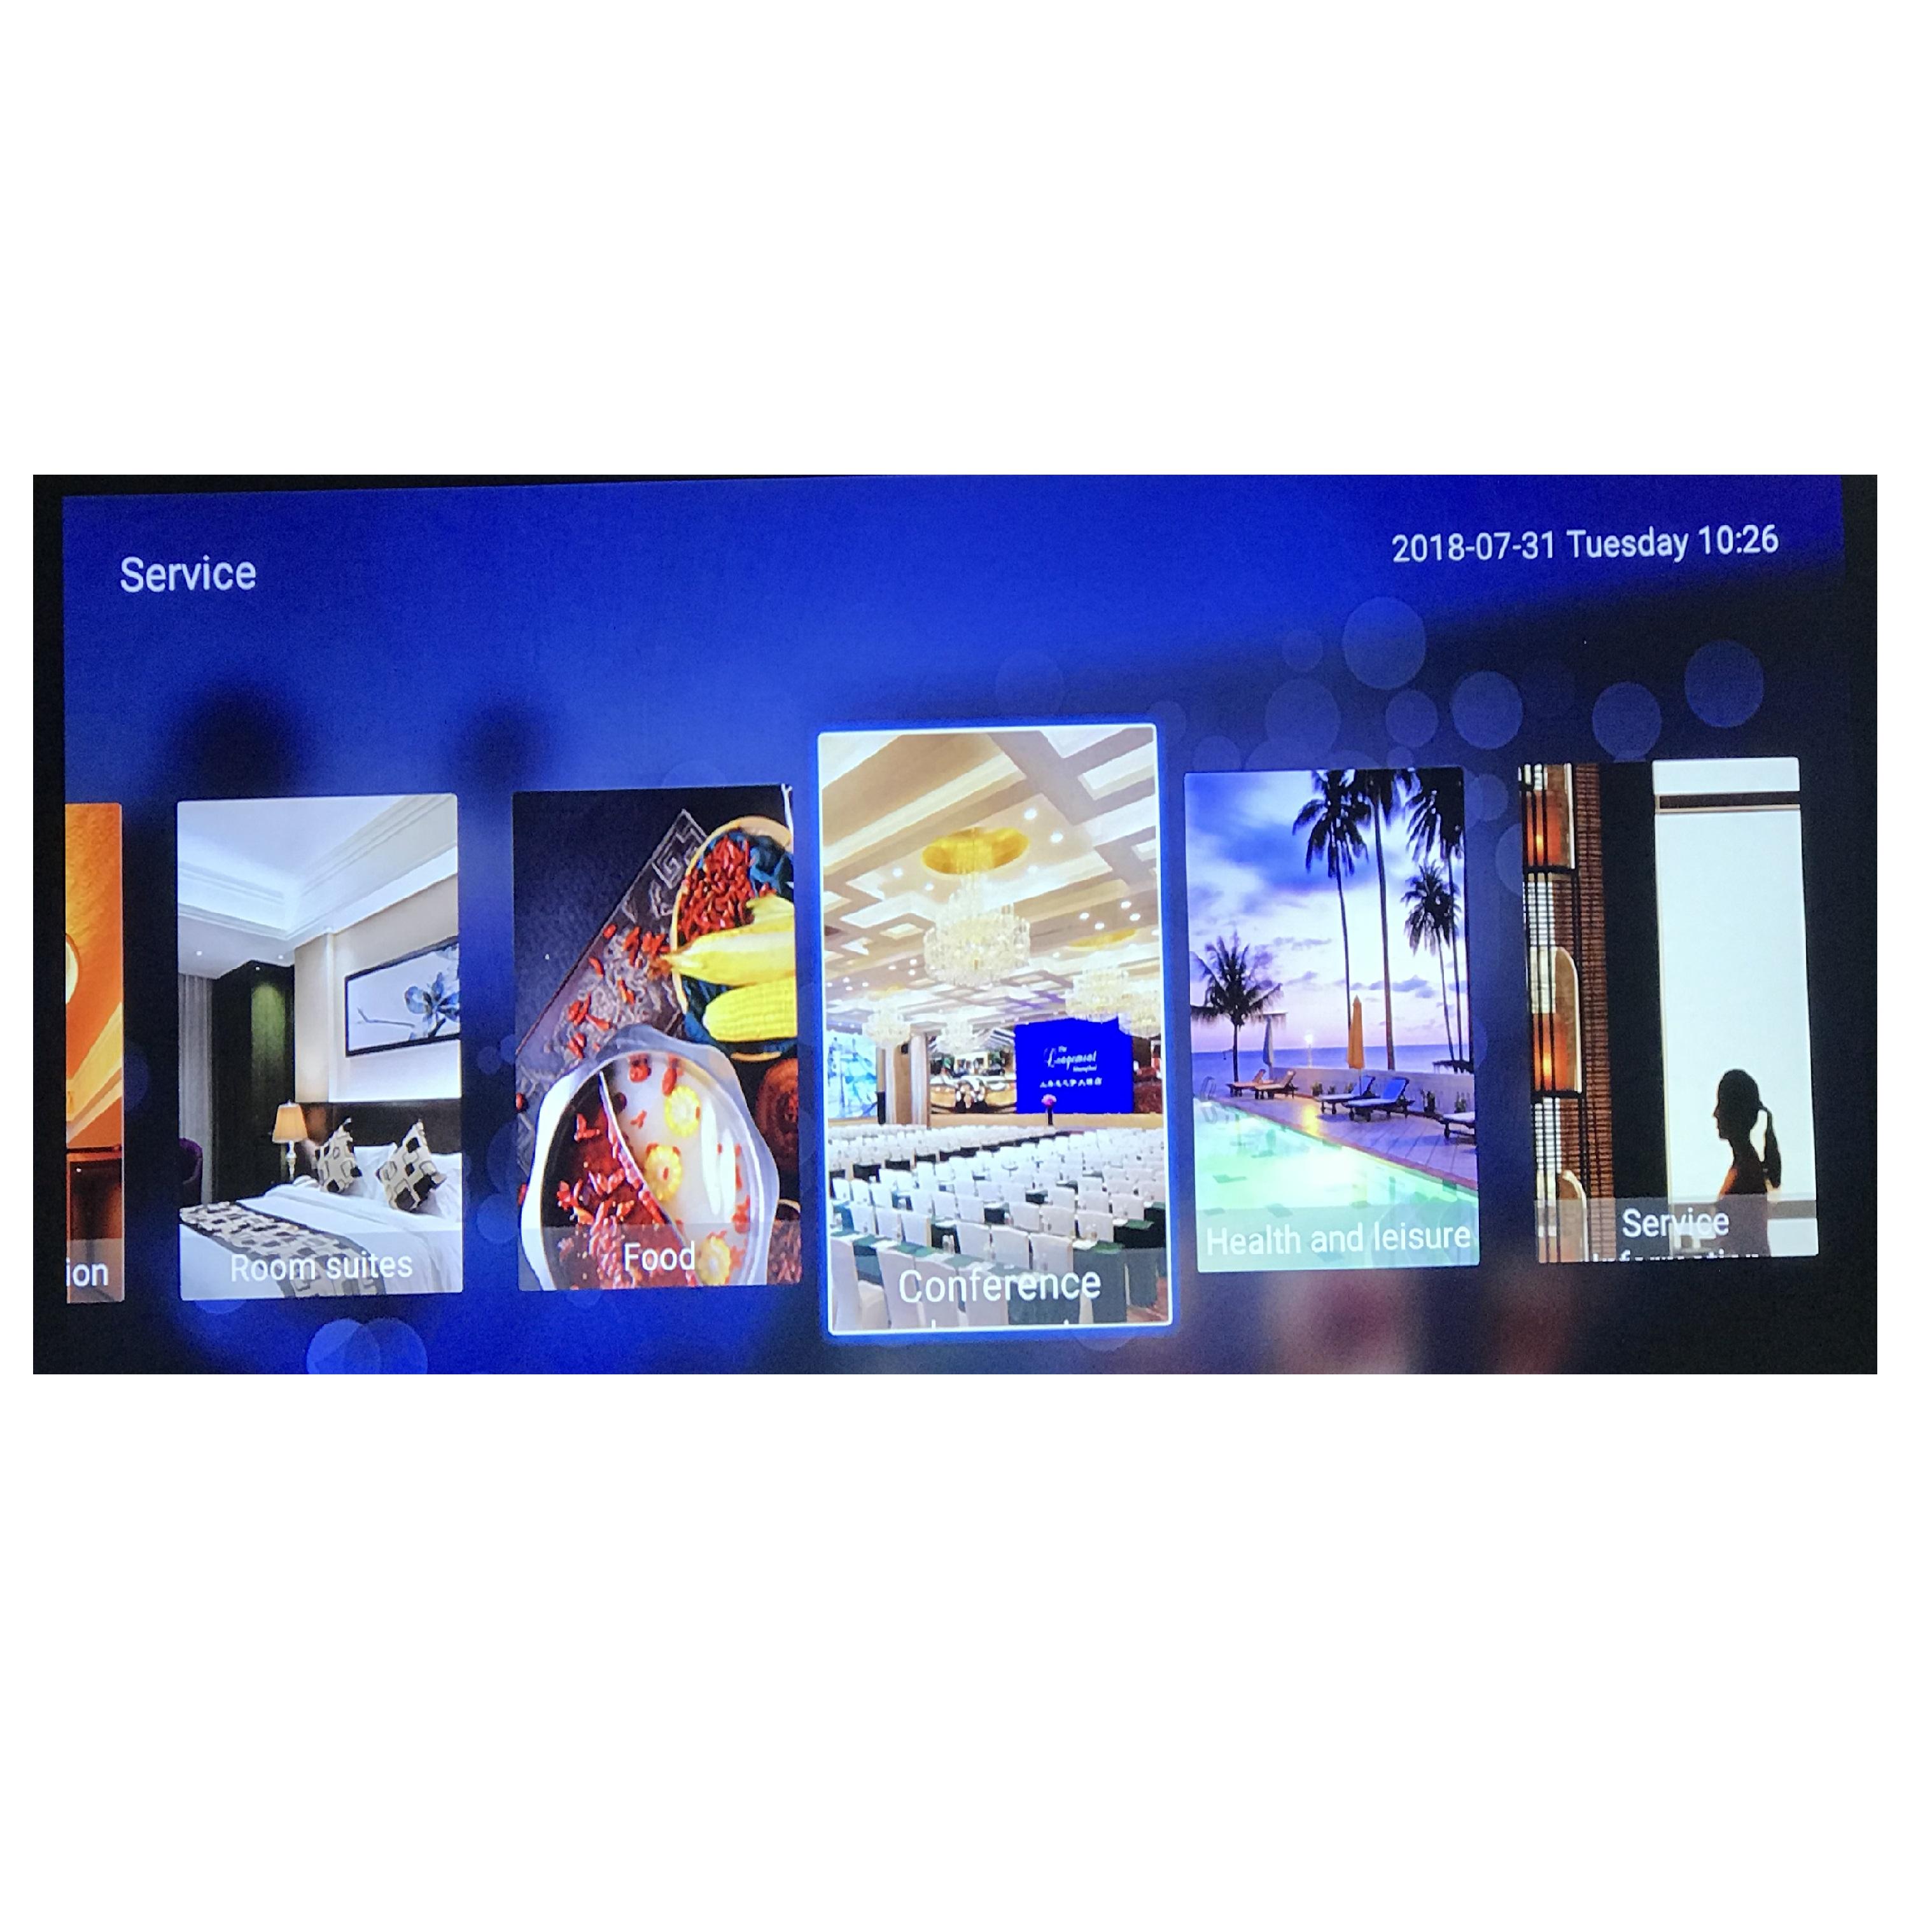 HD IPTV Panel Software for Resale